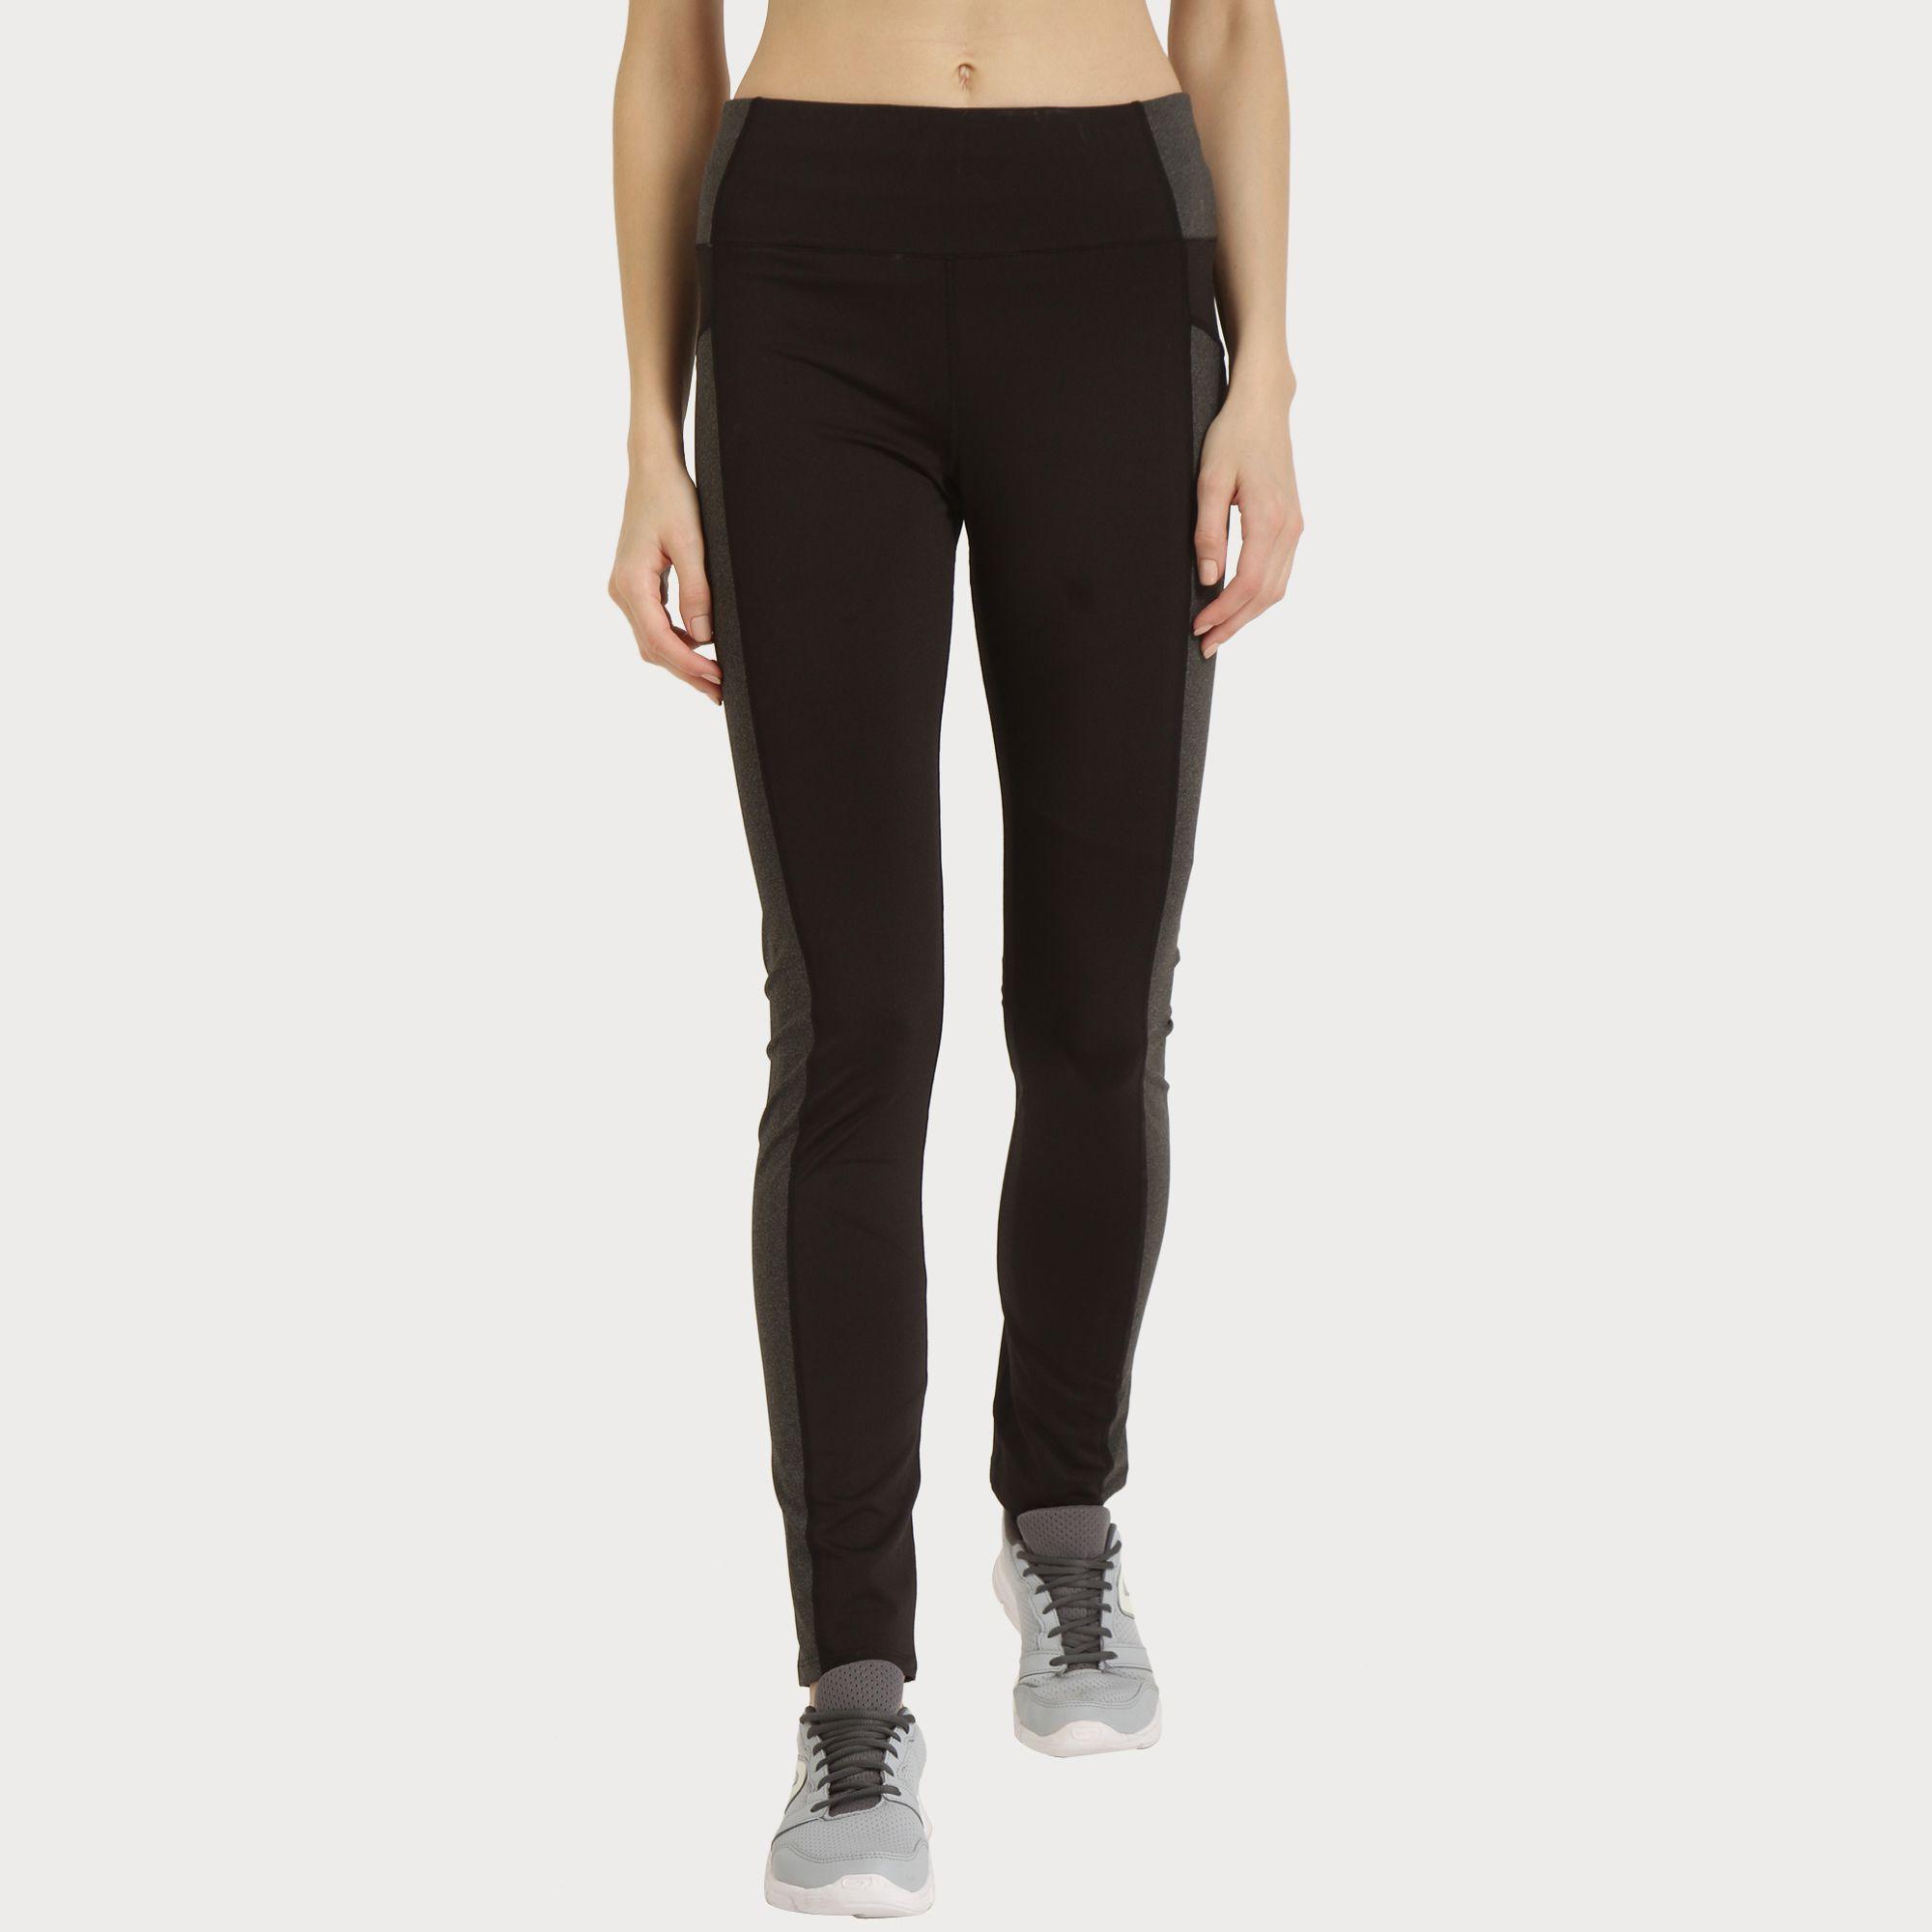 CHKOKKO Women's High Waist Sports Gym Tights Stretchable Yoga Pant